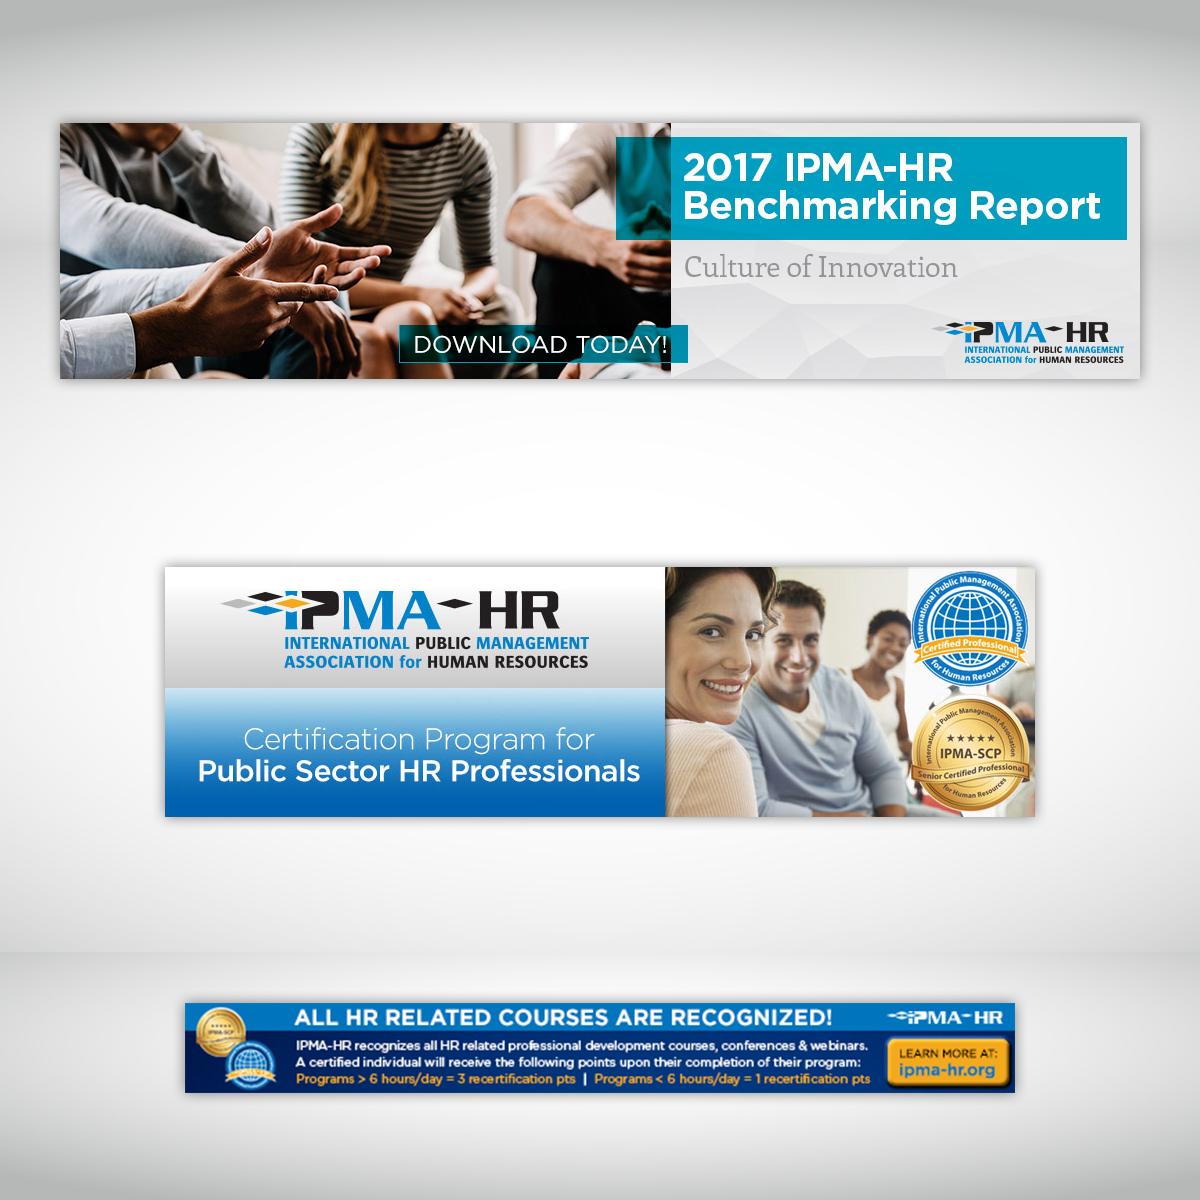 IPMA-HR Random Web Banners